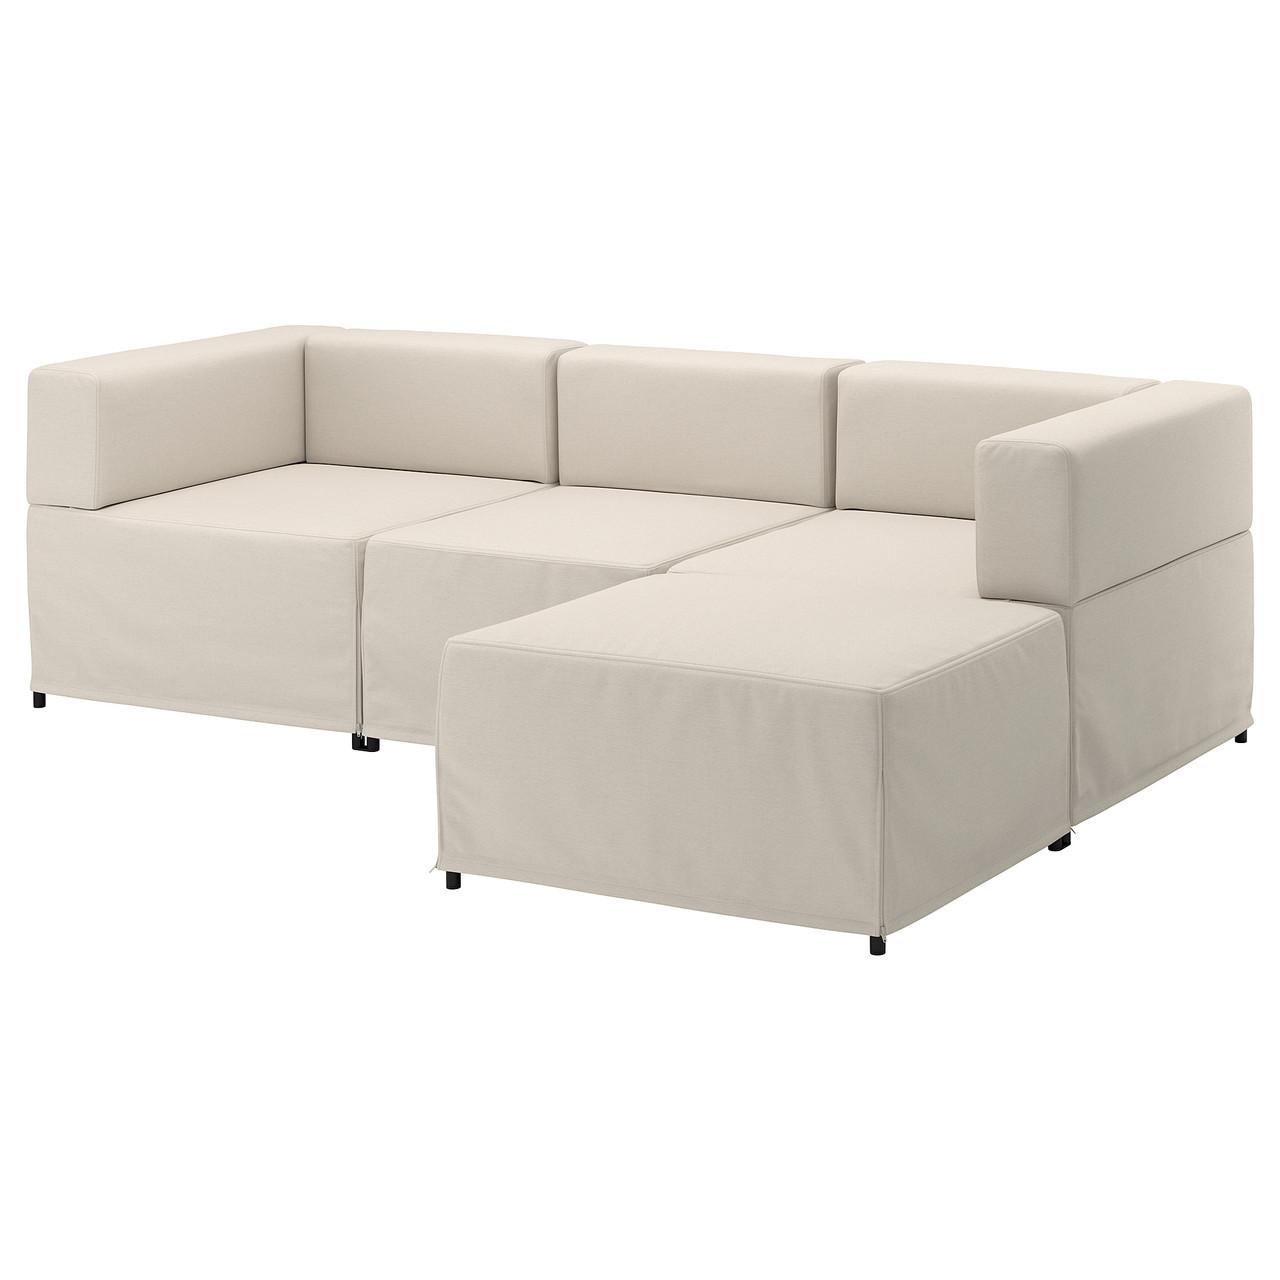 Диван IKEA KUNGSHAMN модульный 3-местный Idekulla бежевый 192.513.81